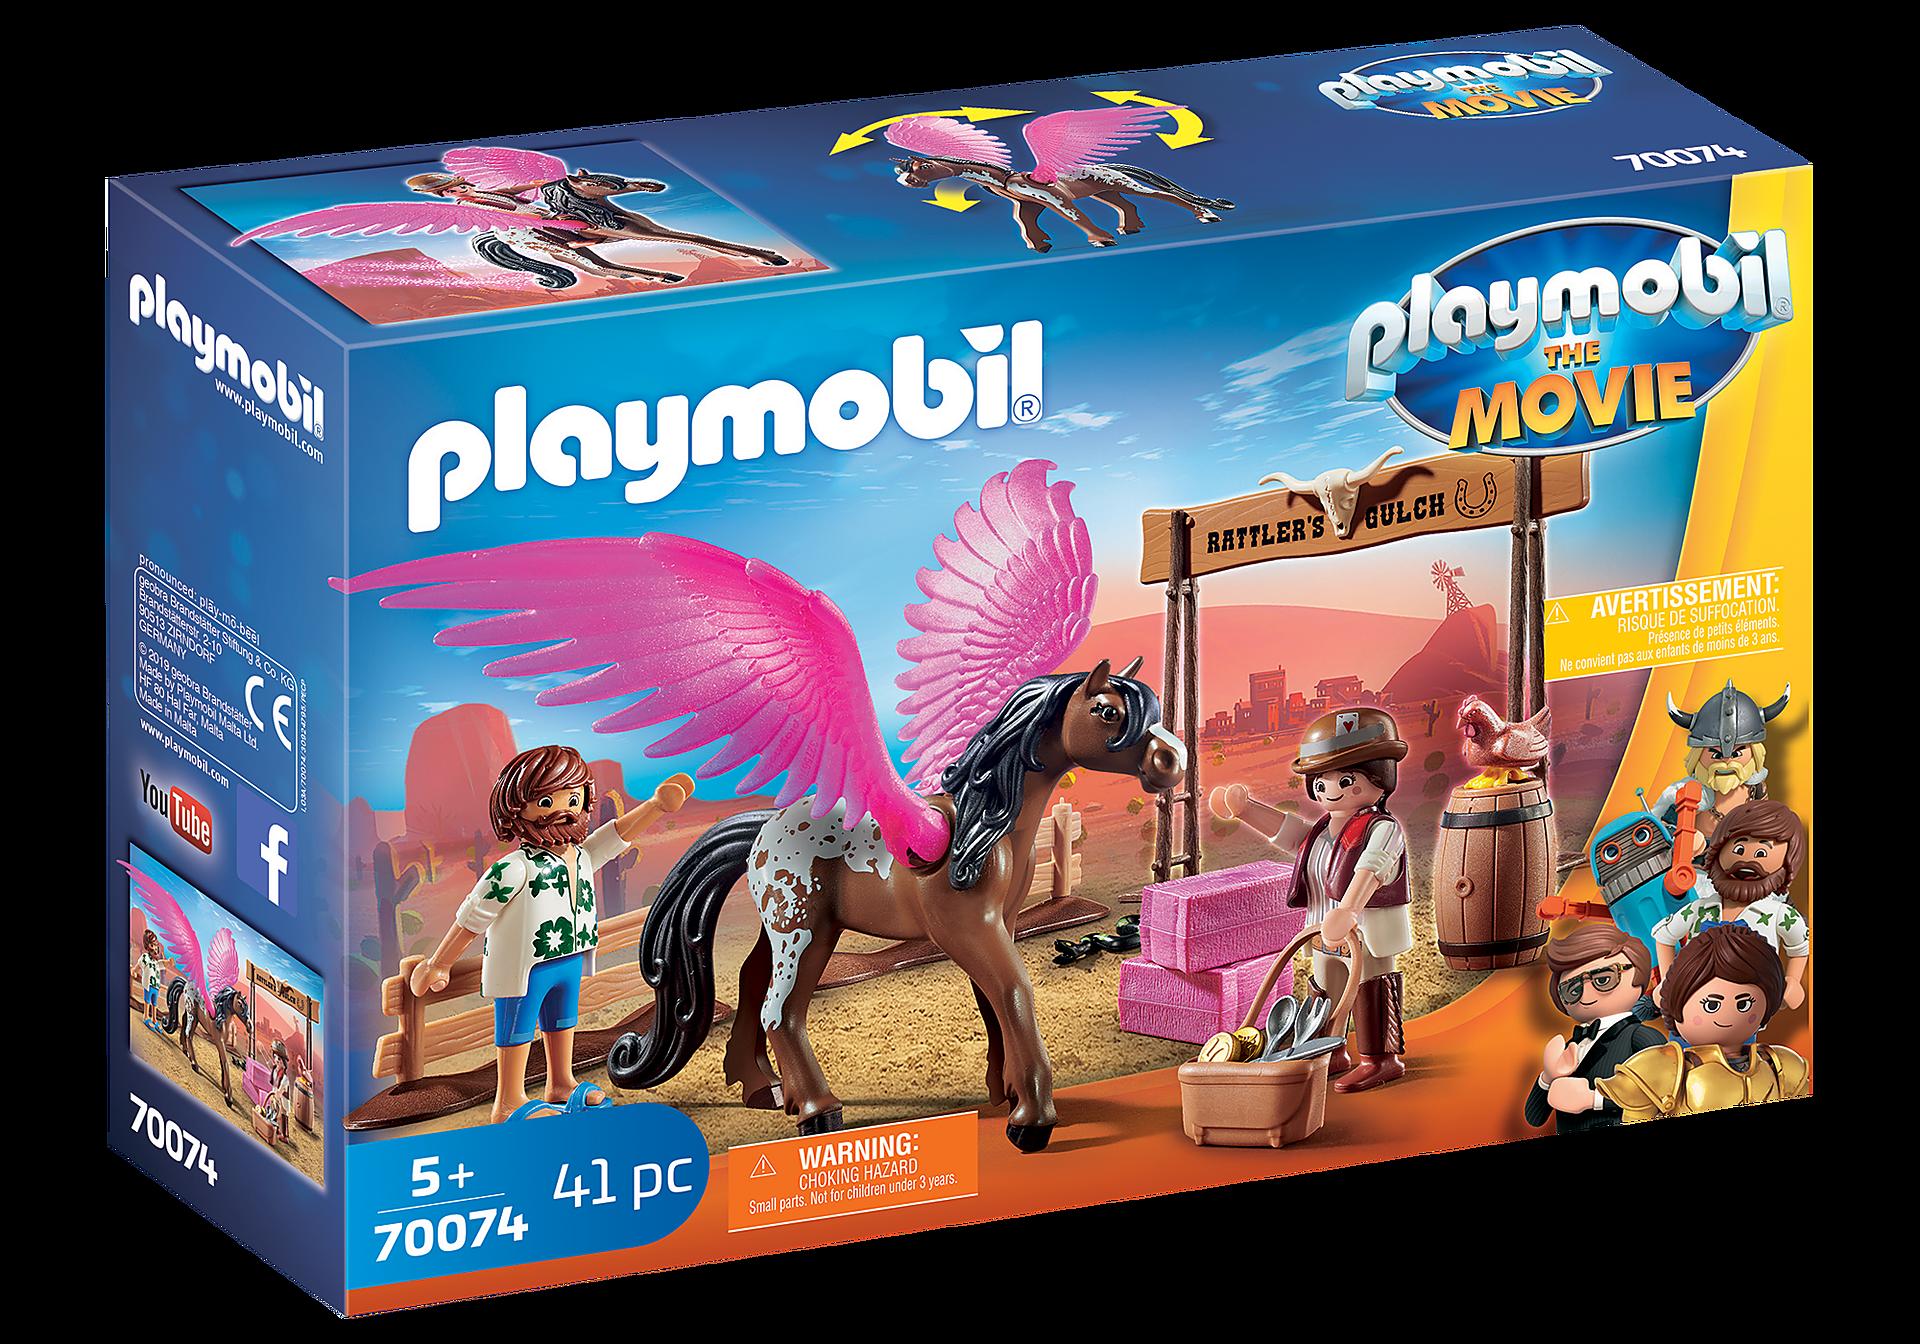 http://media.playmobil.com/i/playmobil/70074_product_box_front/PLAYMOBIL: THE MOVIE Marla, Del e Cavalo com Asas